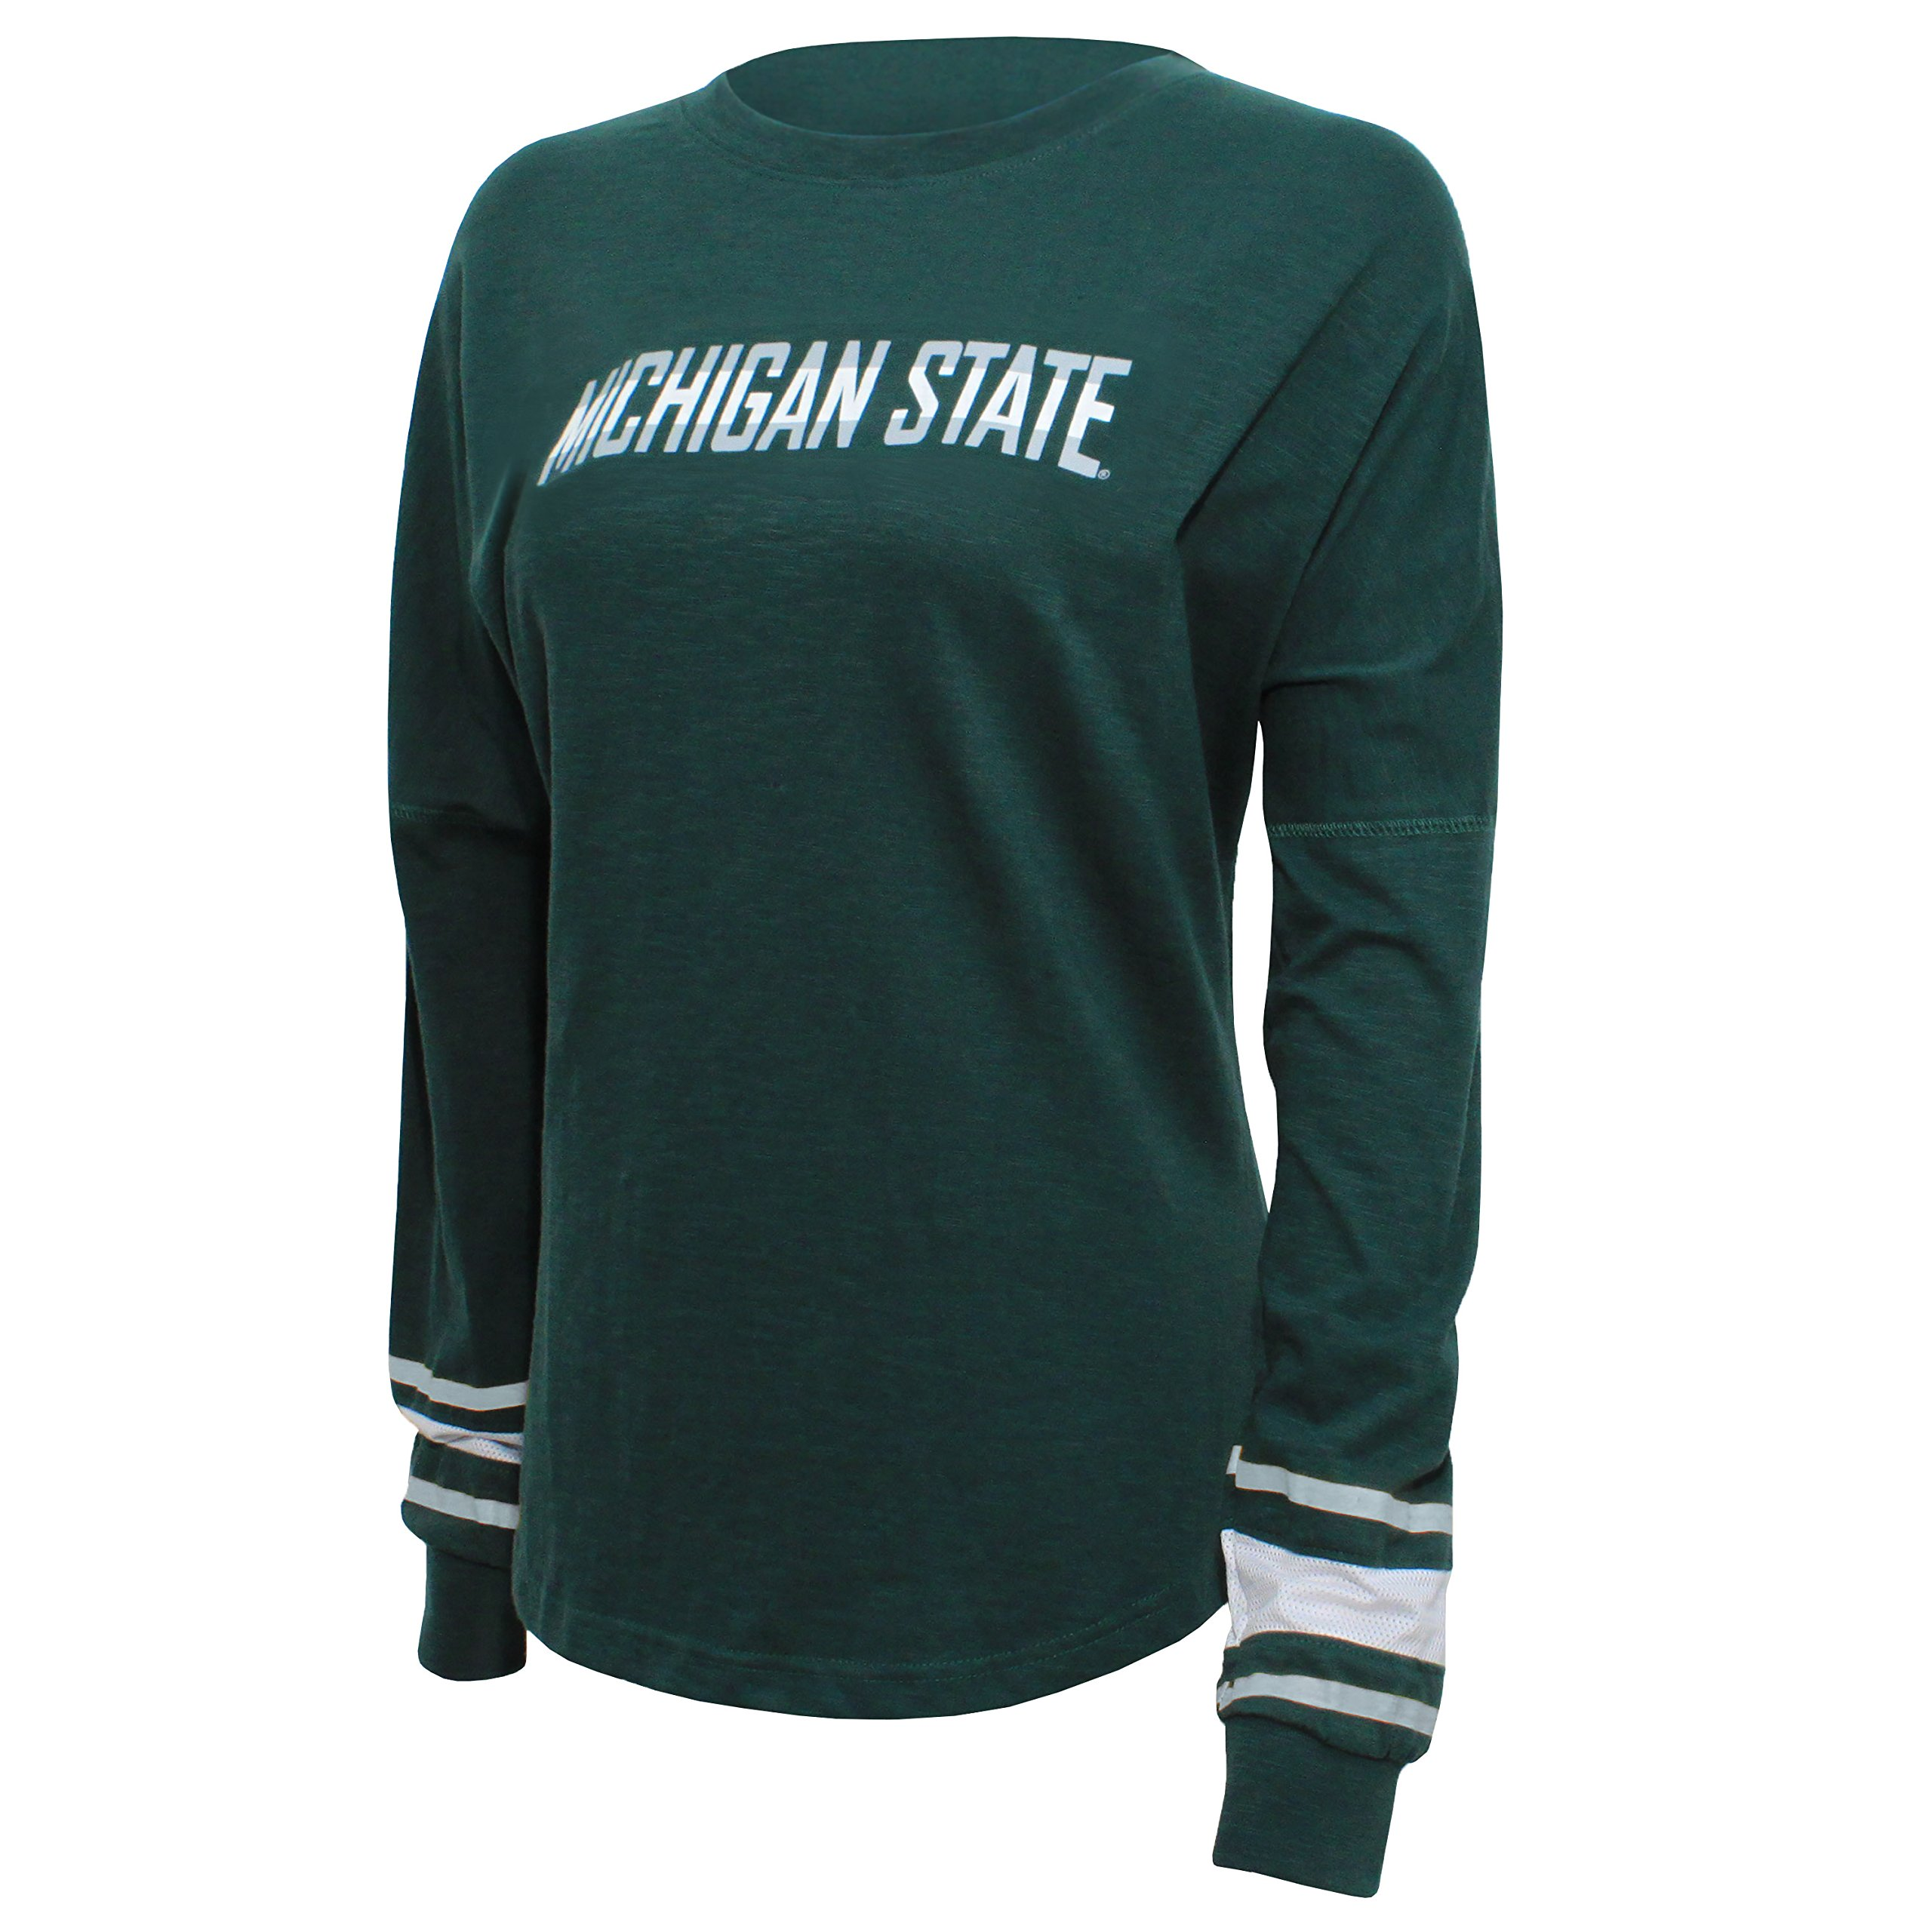 NCAA Michigan State Spartans Women's Campus Specialties Long Sleeve Fan Tee, X-Large, Dark Green